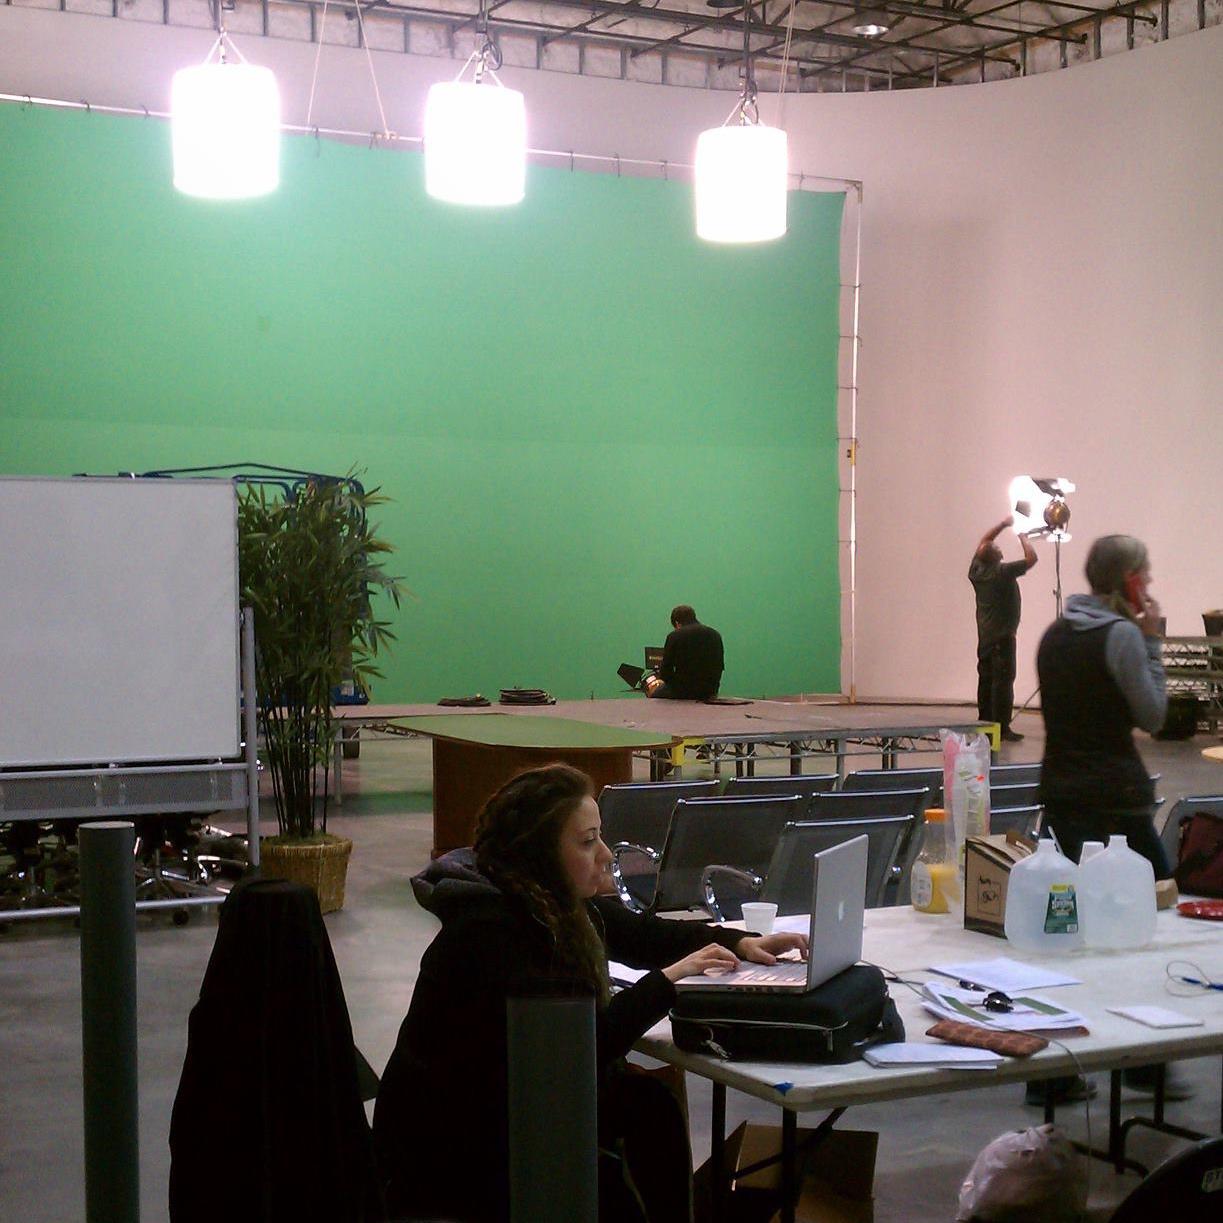 Nasreen Alkhateeb producing at Steiner Studios in Brooklyn, New York